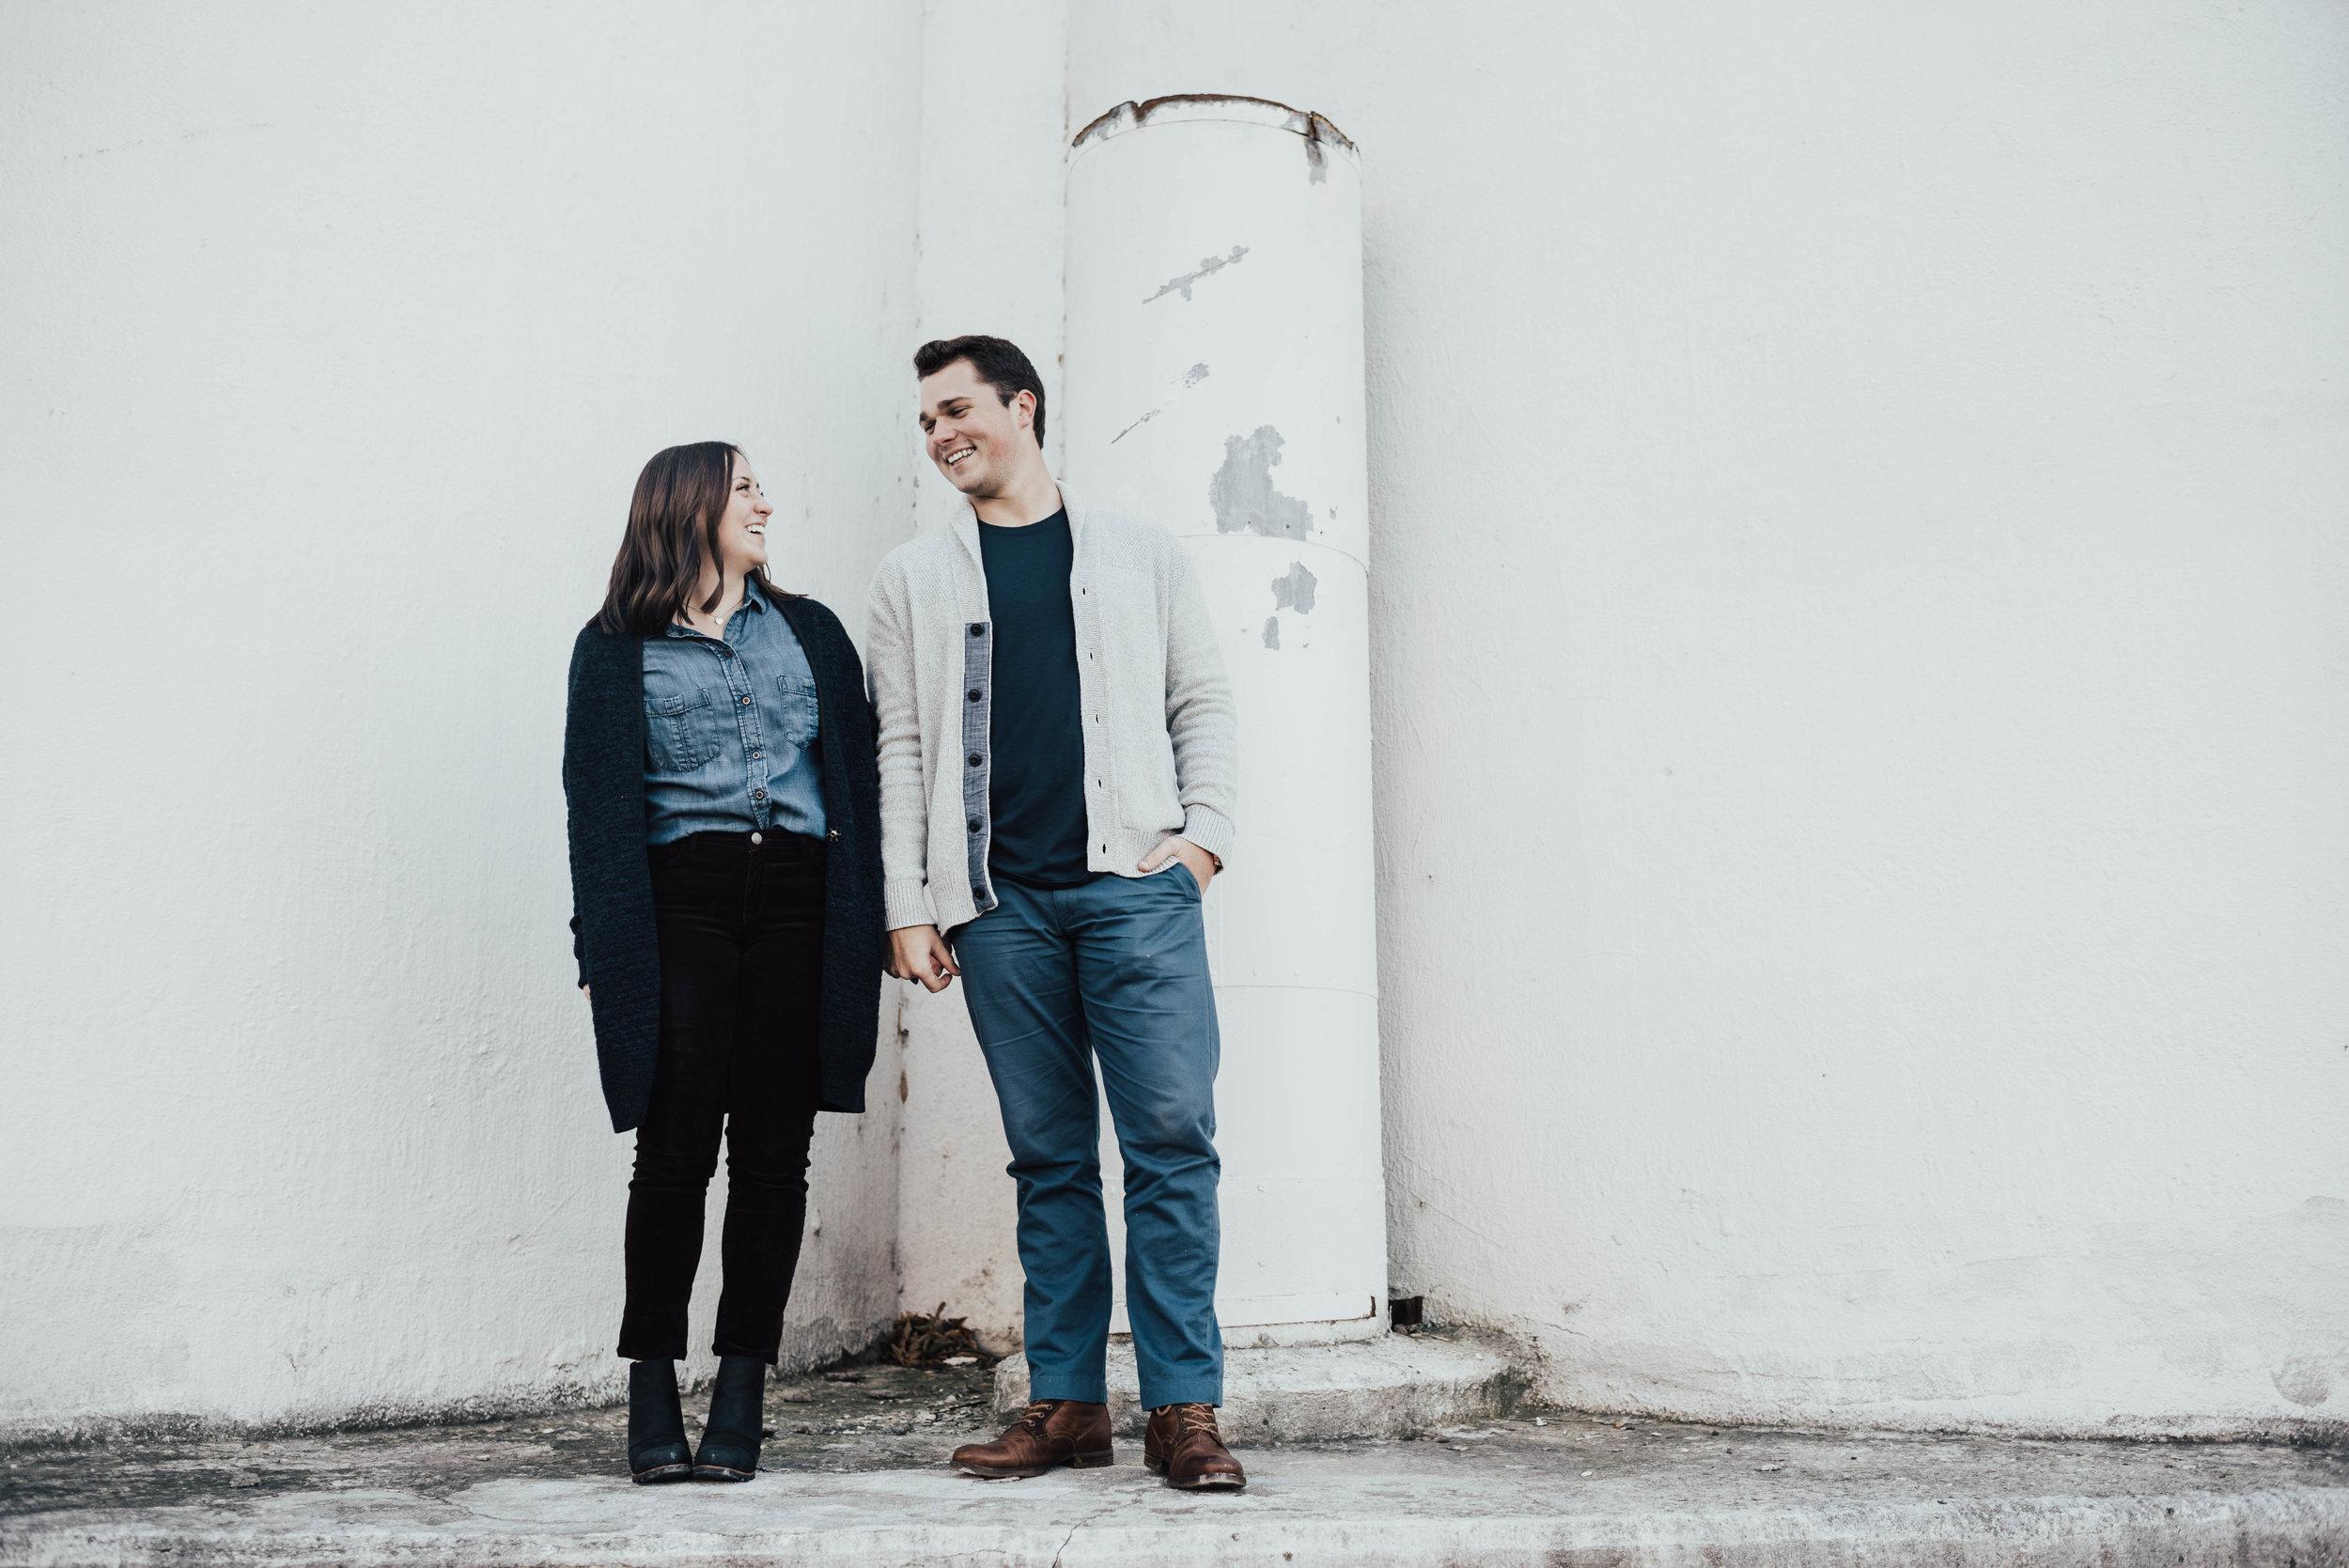 Steena-Anne-Photography-Samantha-Josh-Minneapolis-Winter-Engagement107.jpg